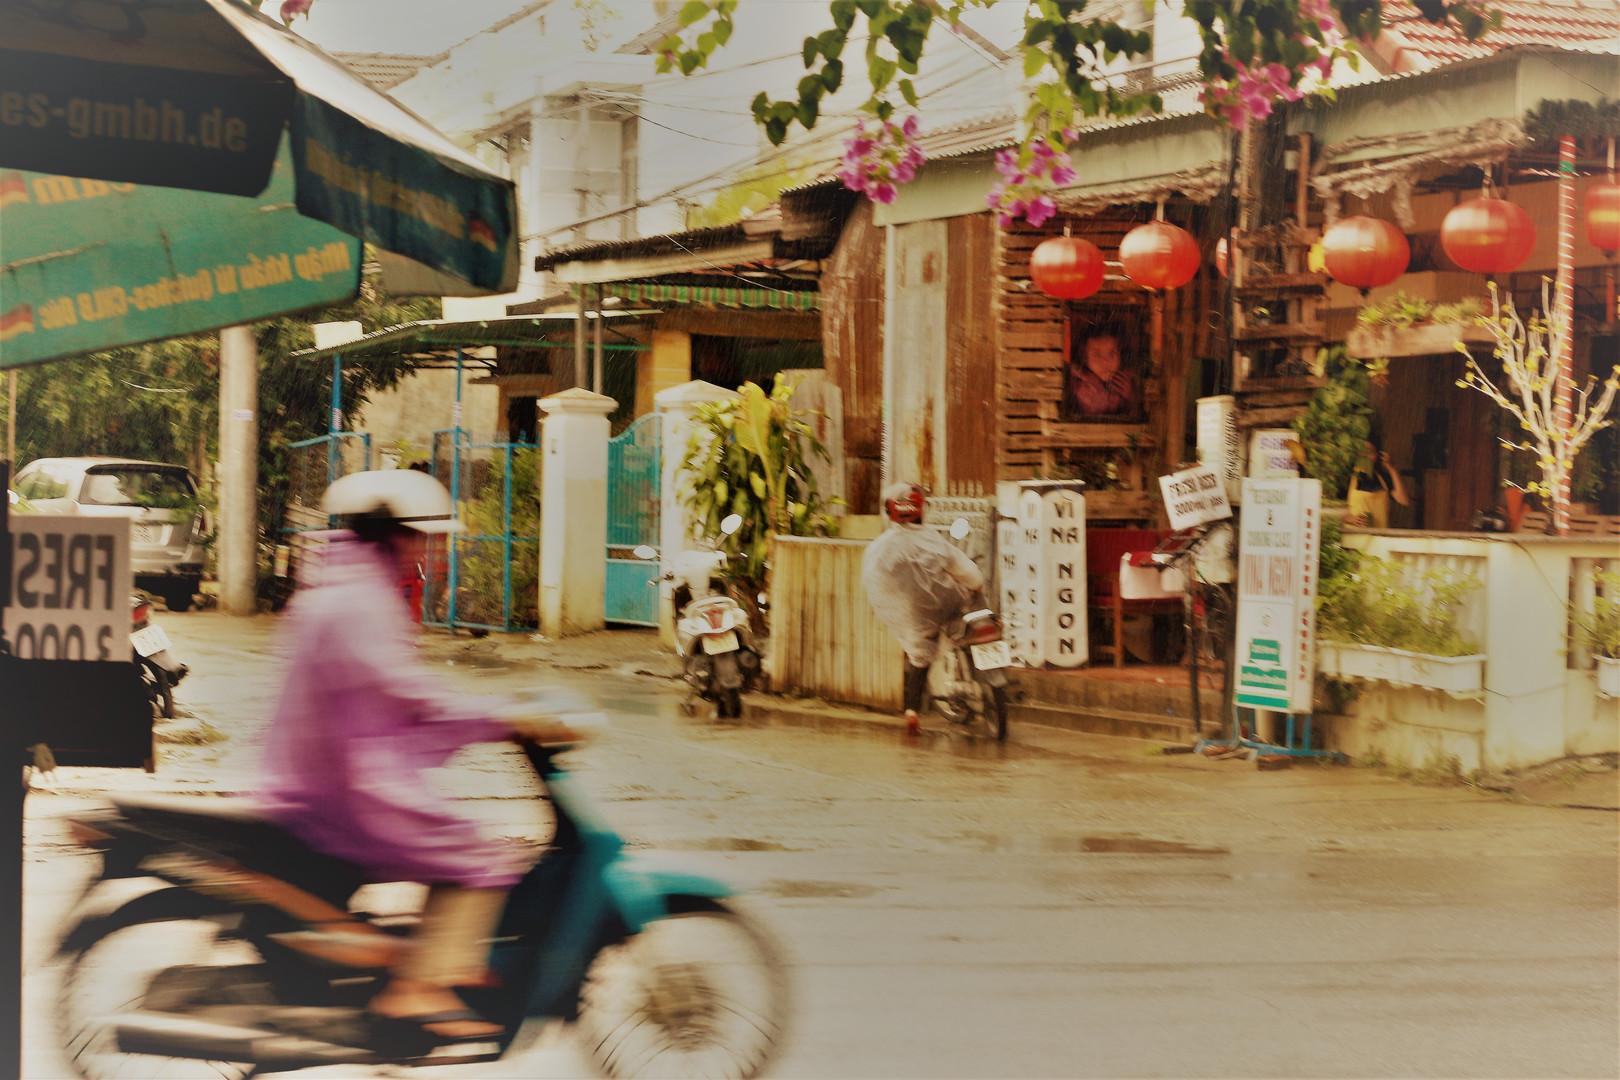 Vietnam, Hoi An mouvement 1